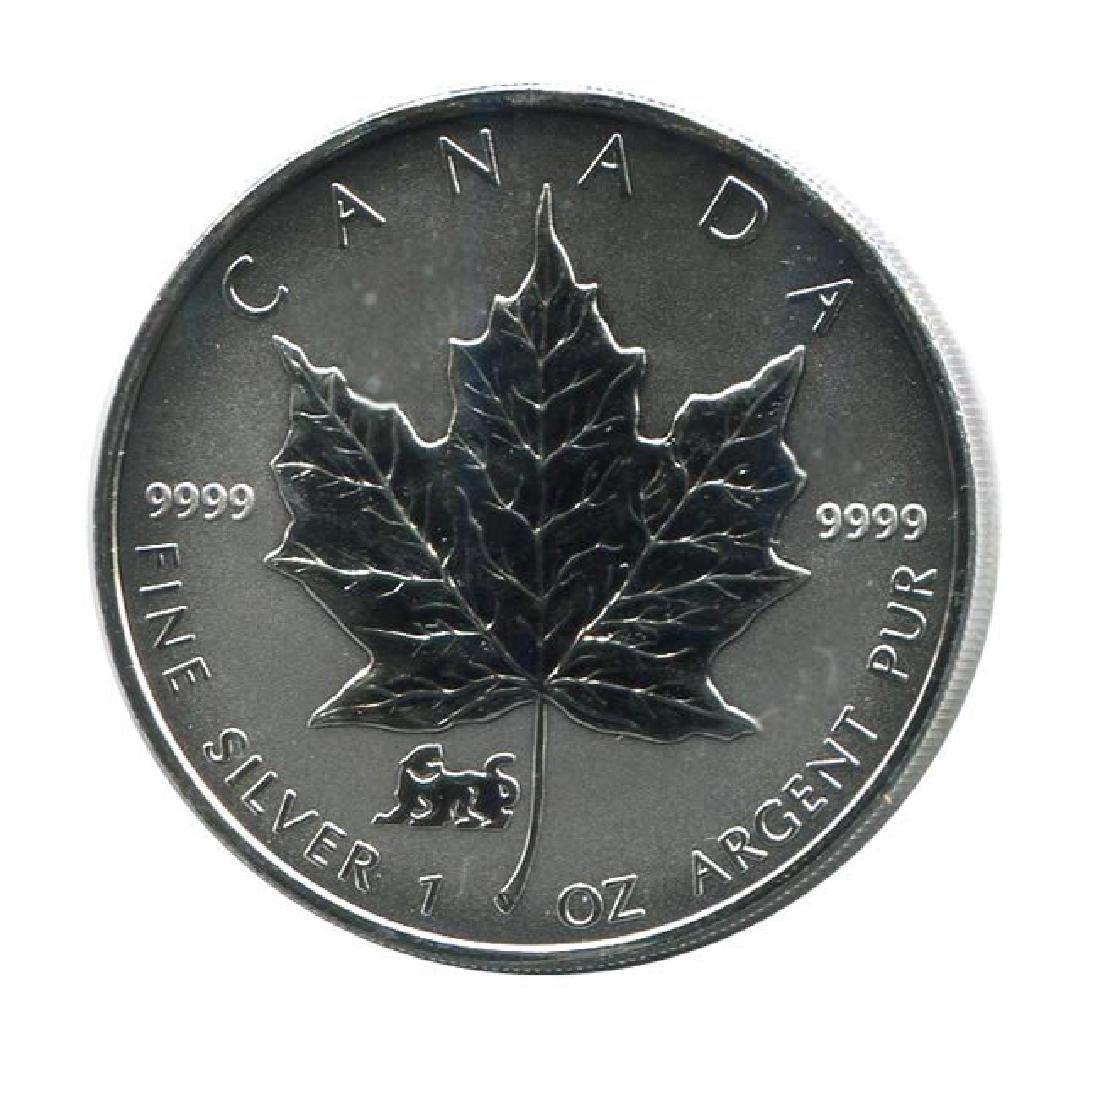 1998 Canada 1 oz. Silver Maple Leaf Reverse Proof Tiger